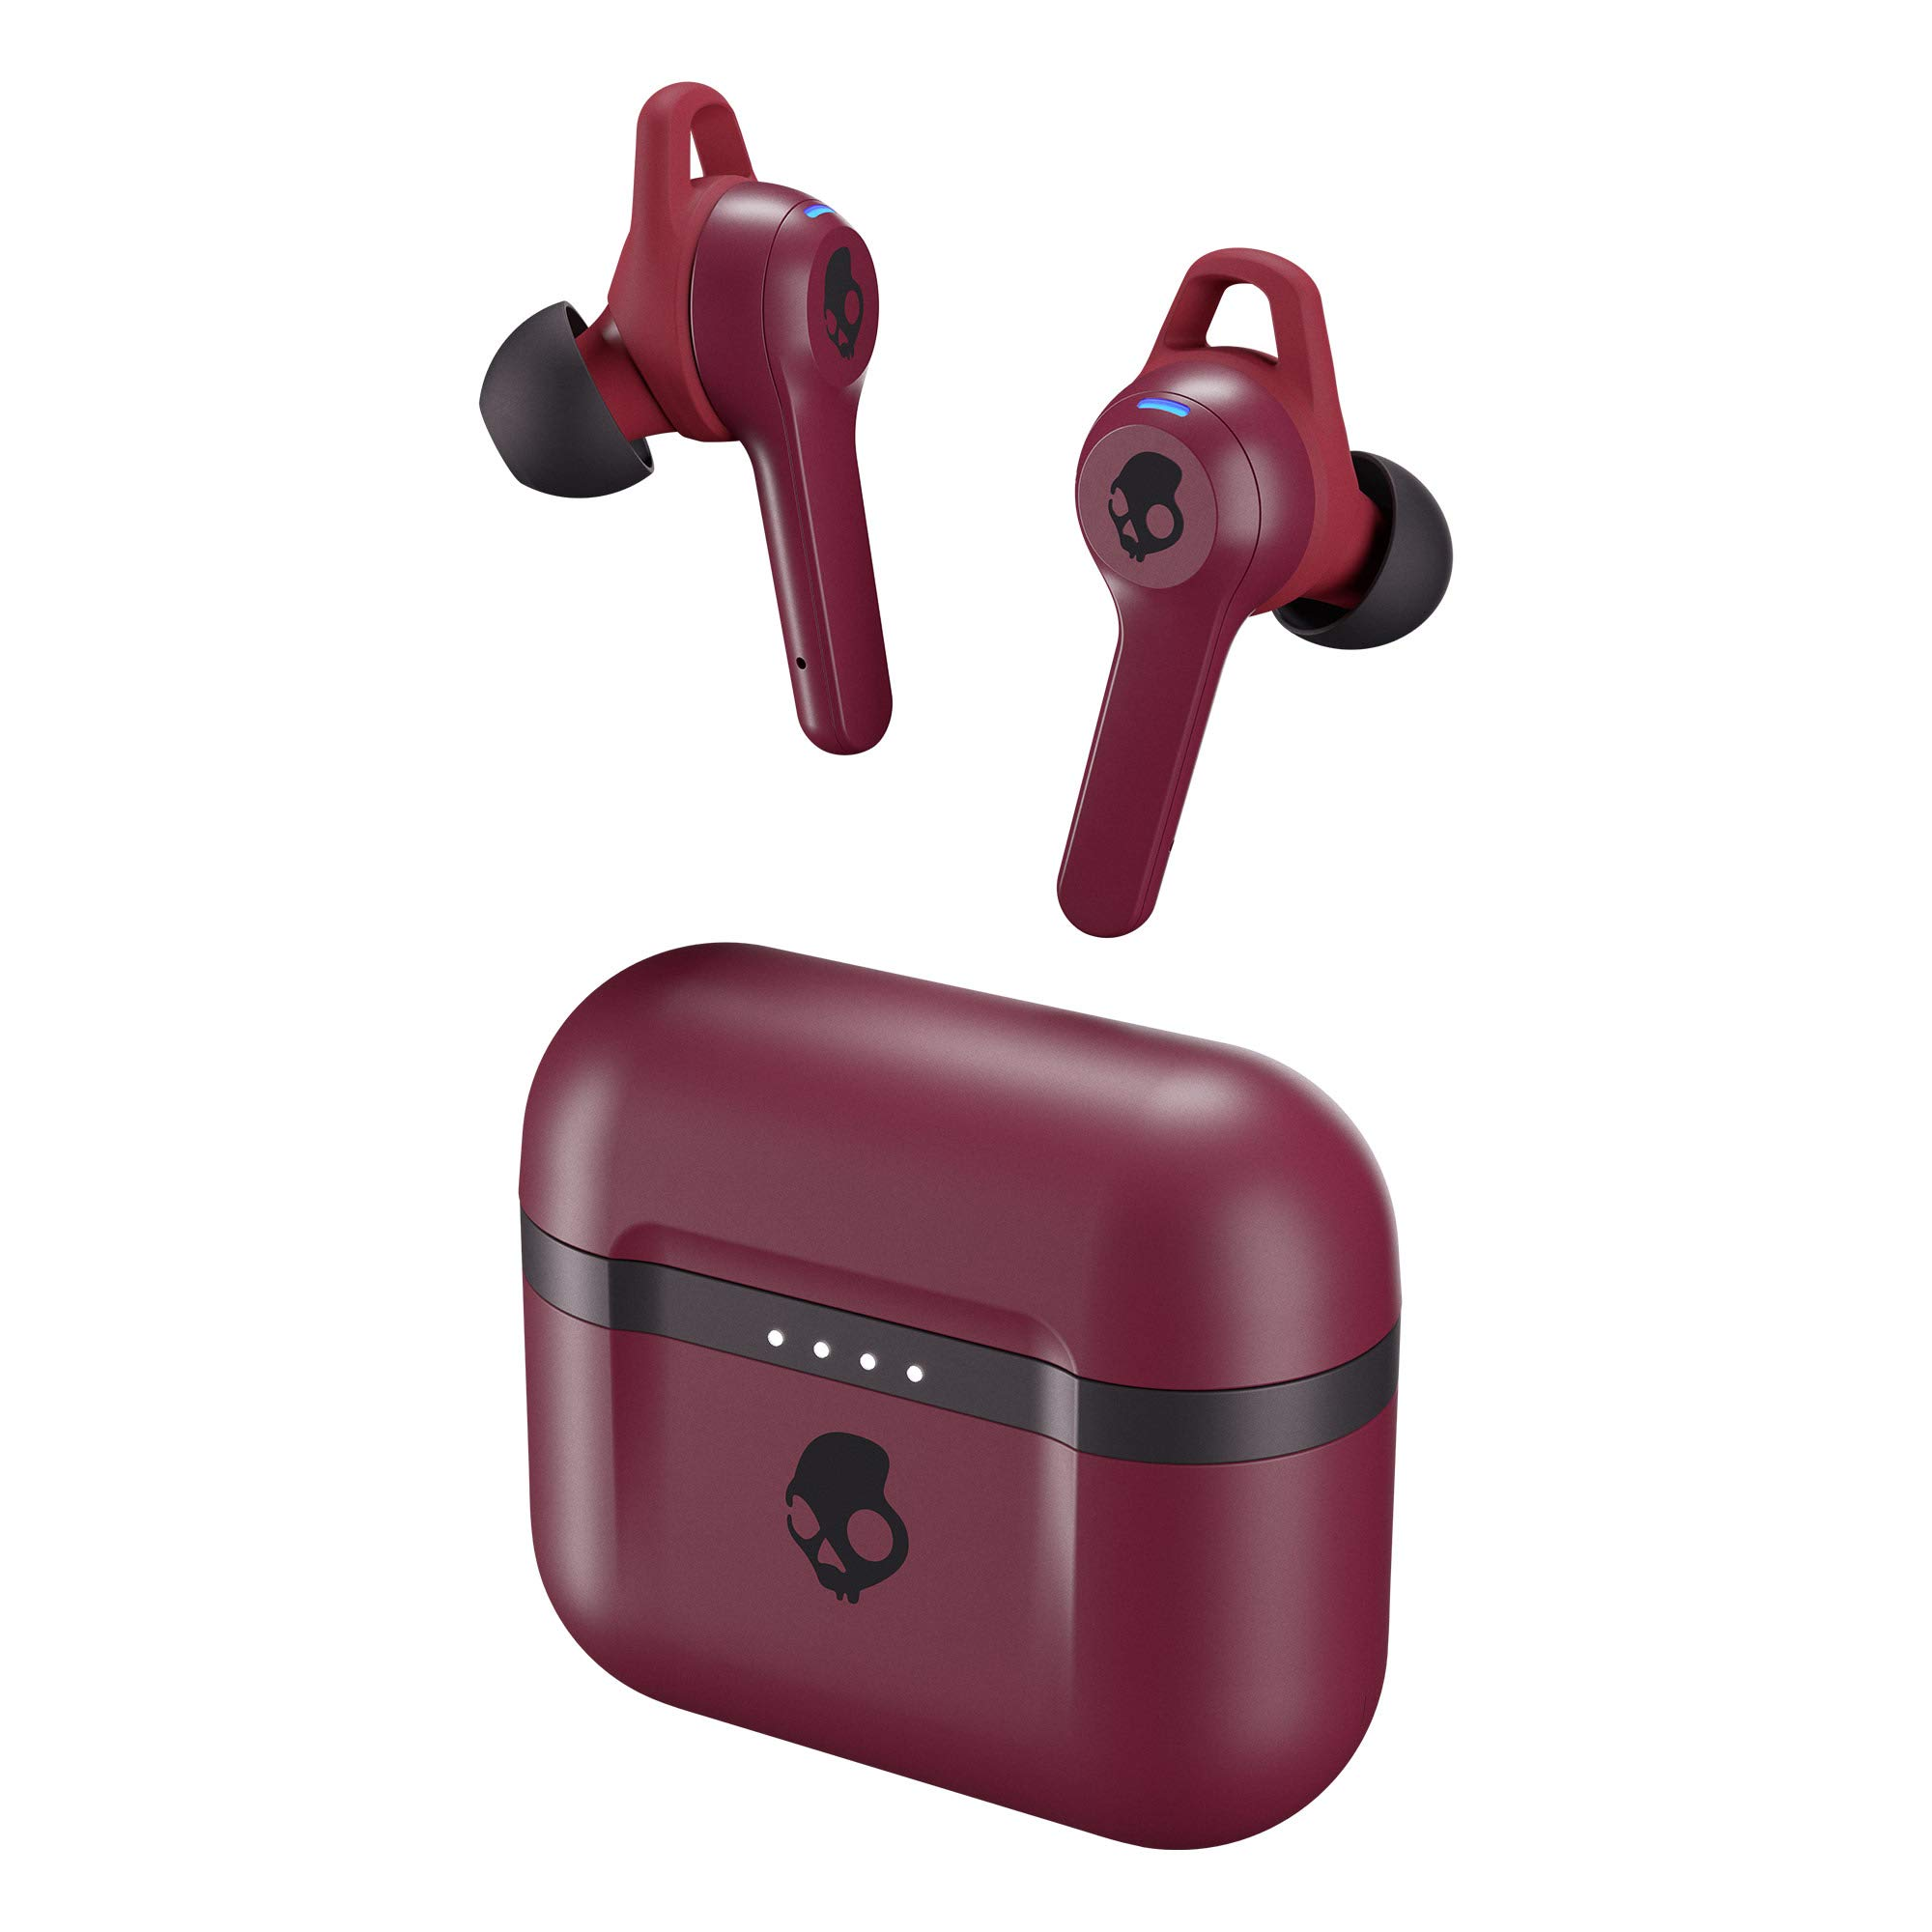 Auriculares Earbuds Inalam. Skullcandy Deep Red  BD500